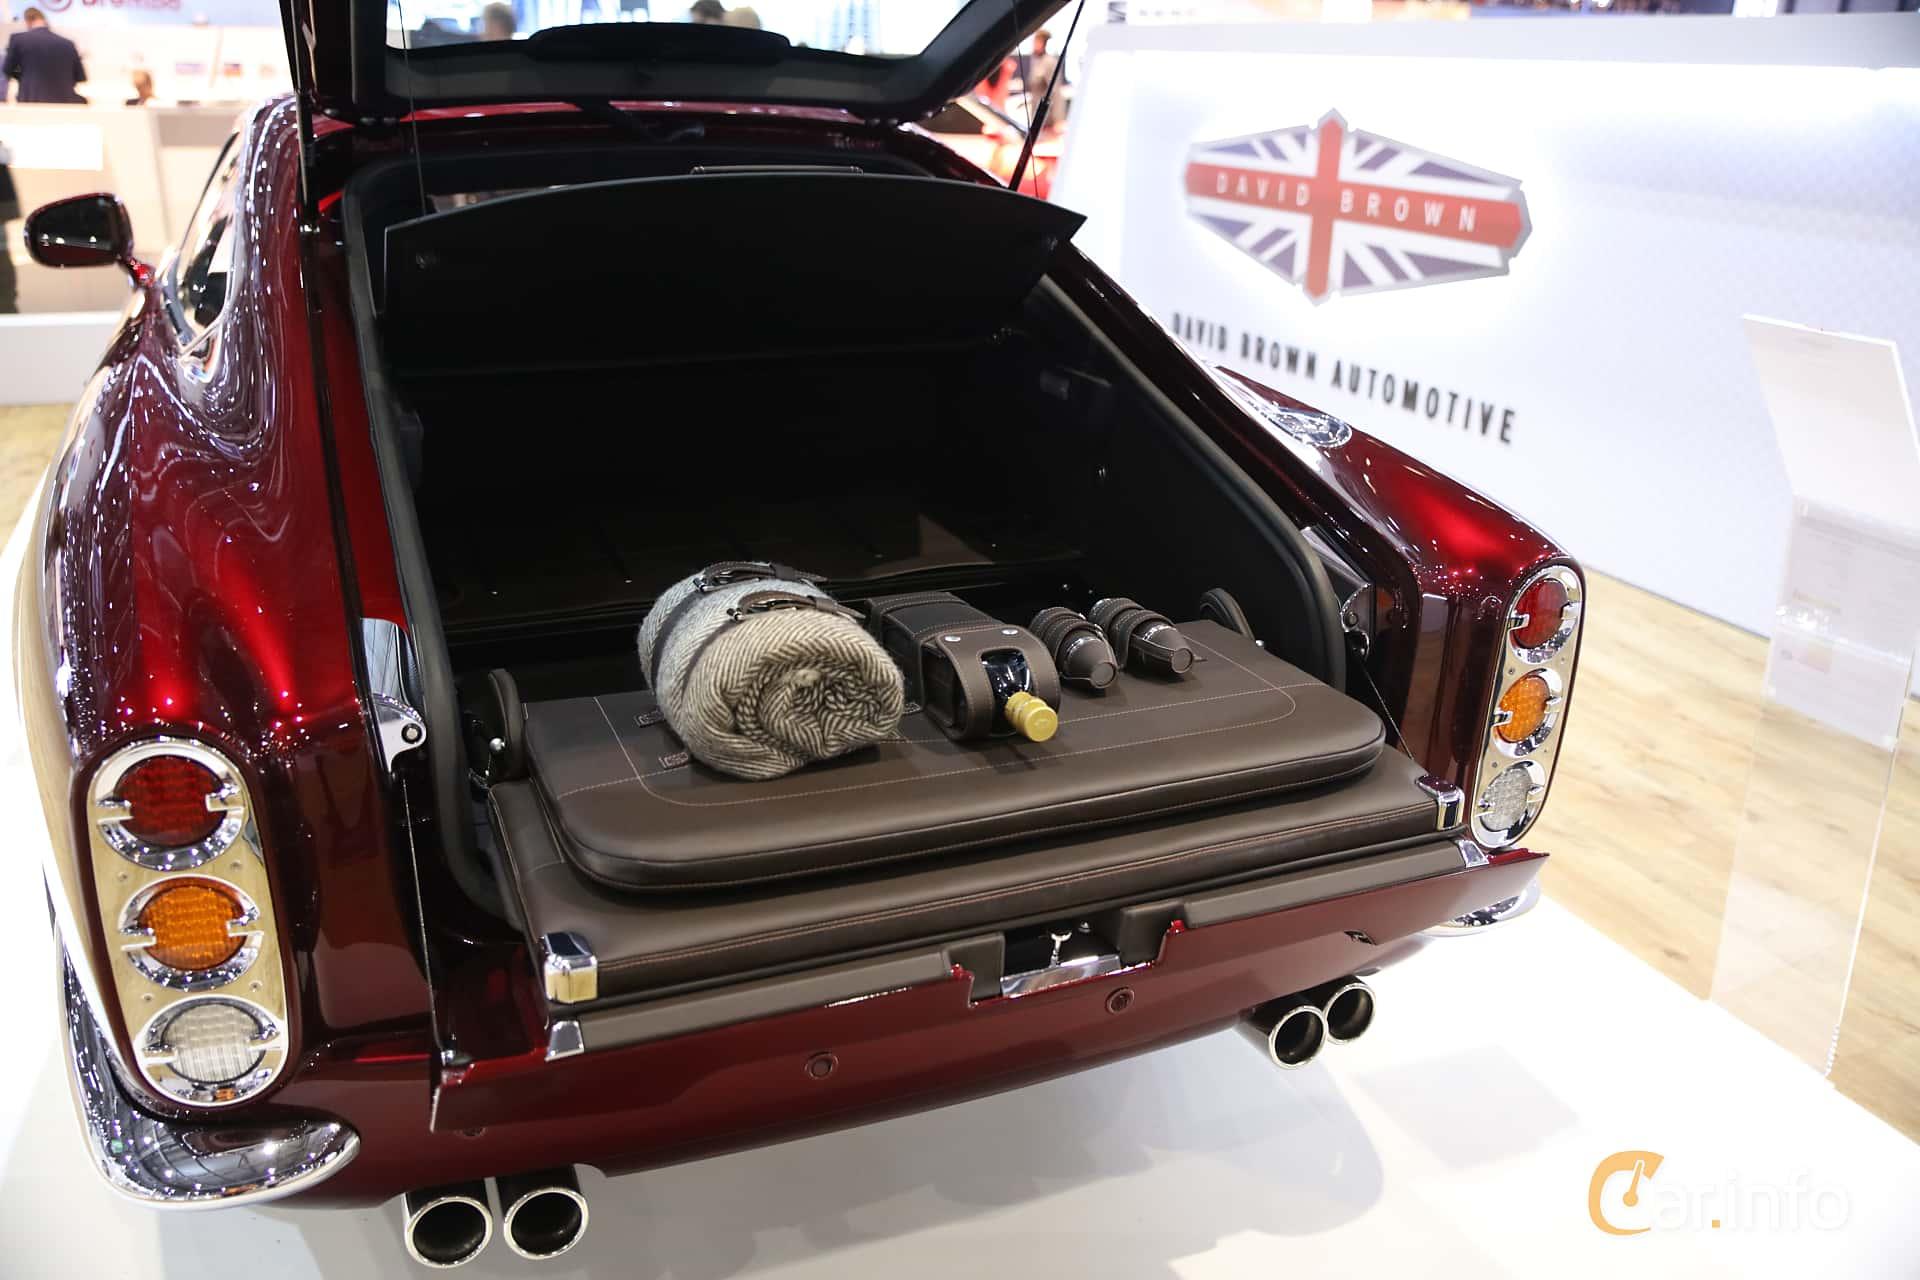 David Brown Speedback GT 5.0 V8 Automatic, 609hp, 2019 at Geneva Motor Show 2019